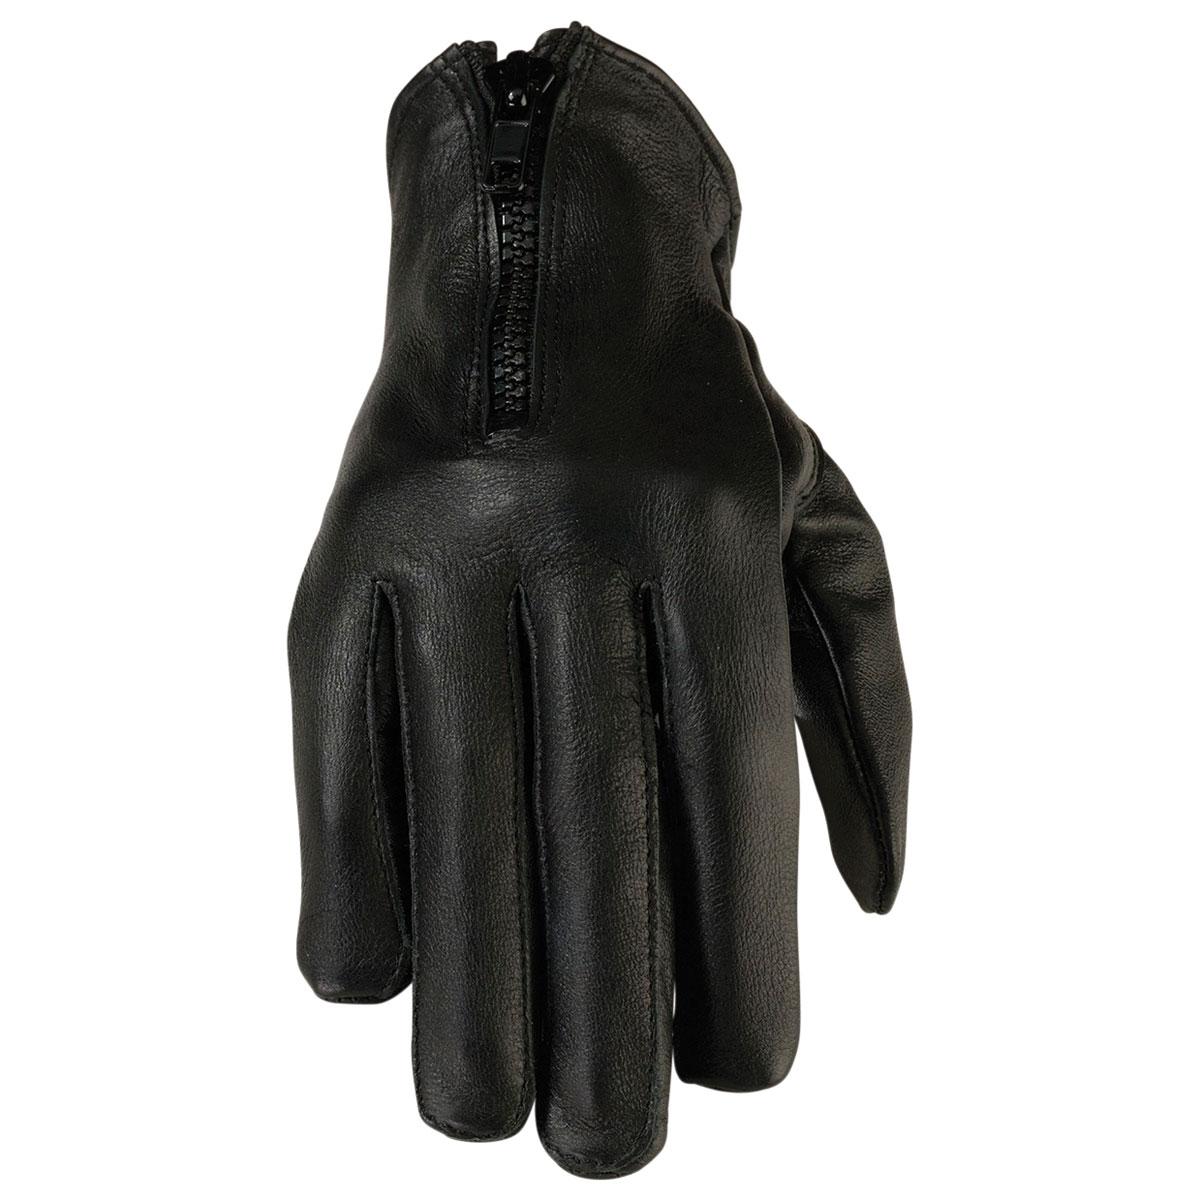 Z1R Women's 7MM Black Leather Gloves